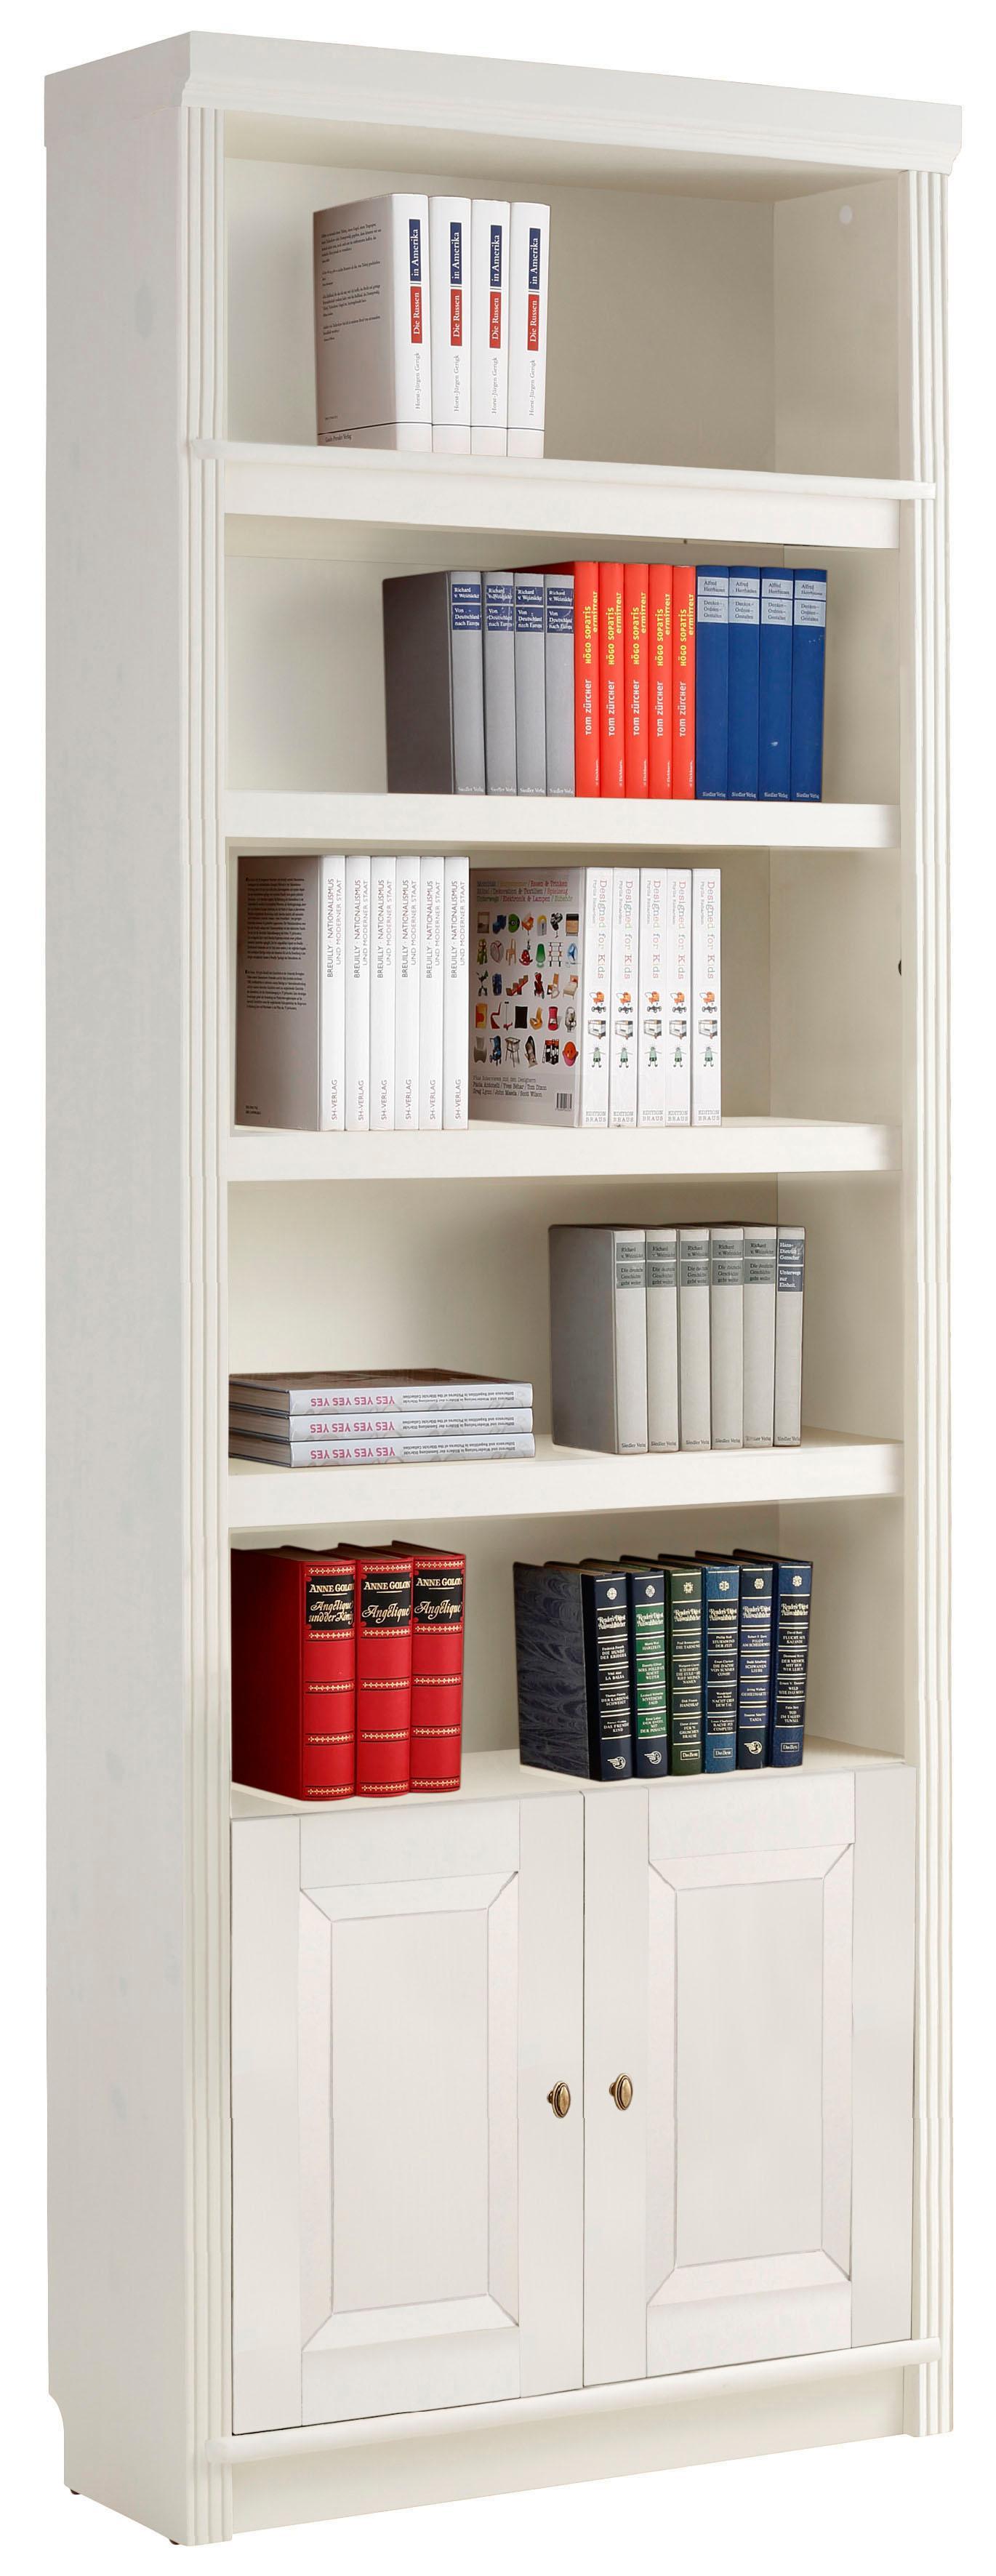 Image of Bücherregal »Serie Soeren«, in 2 Höhen